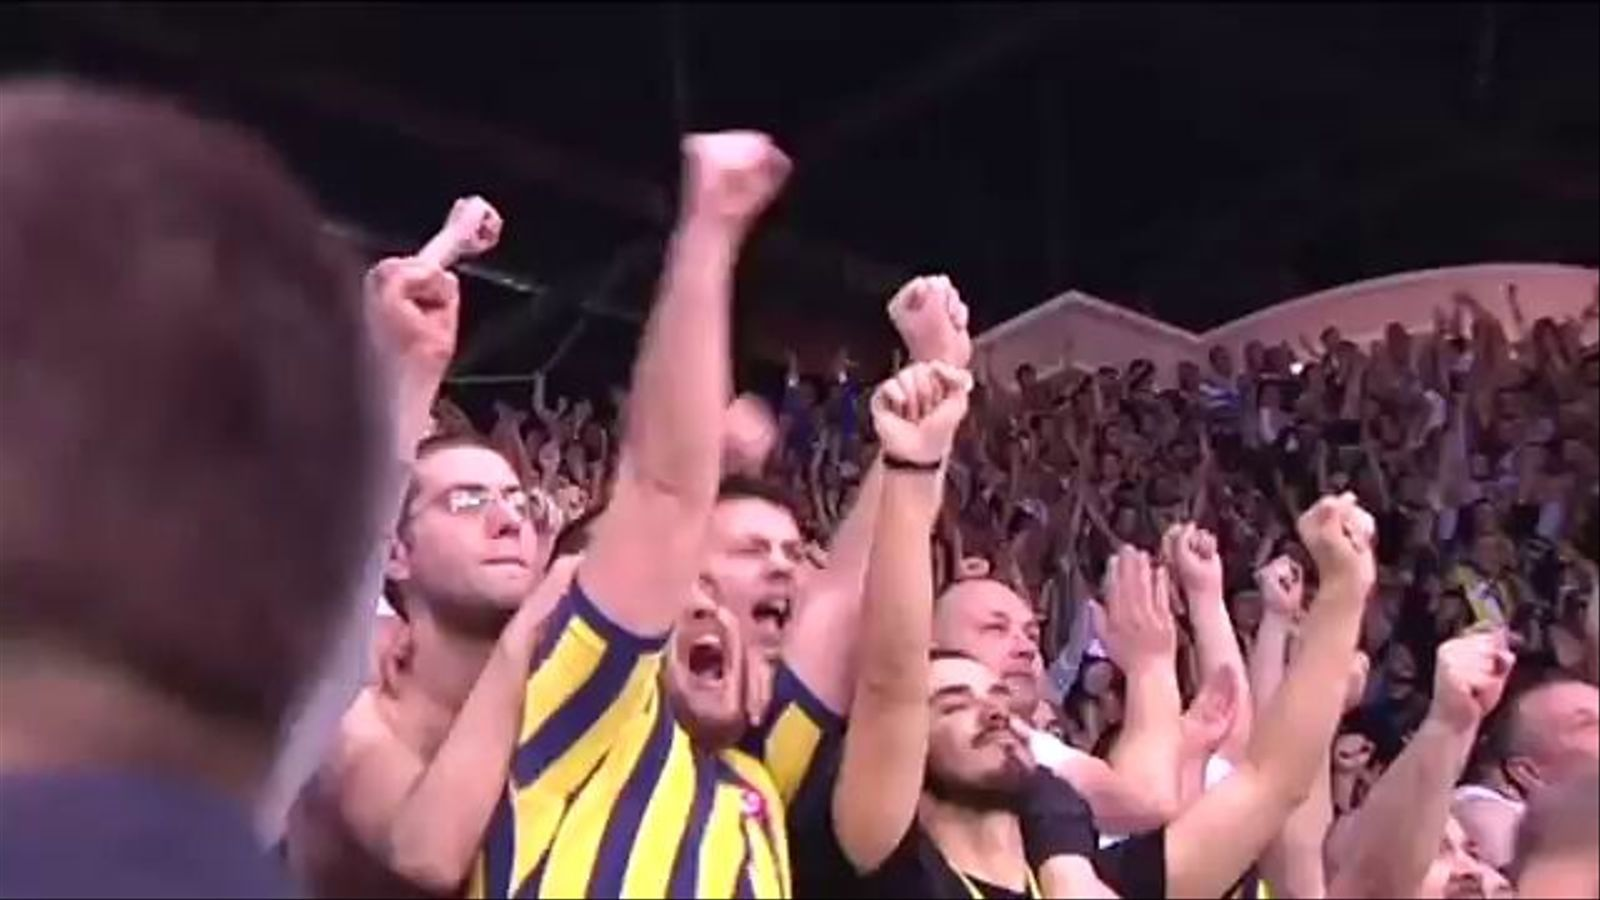 Greus incidents al Fenerbahçe-Galatasaray de bàsquet femení